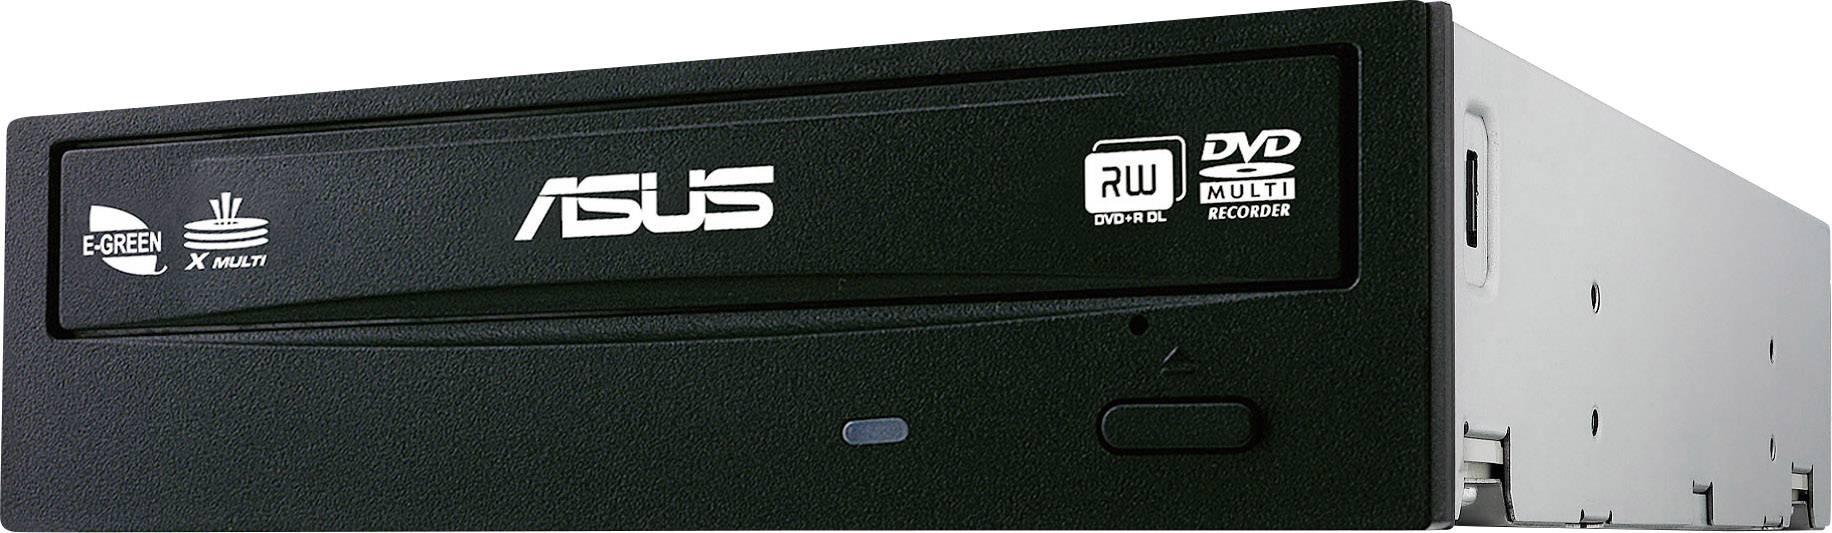 Interní DVD vypalovačka Asus DRW-24D5MT Retail SATA III černá